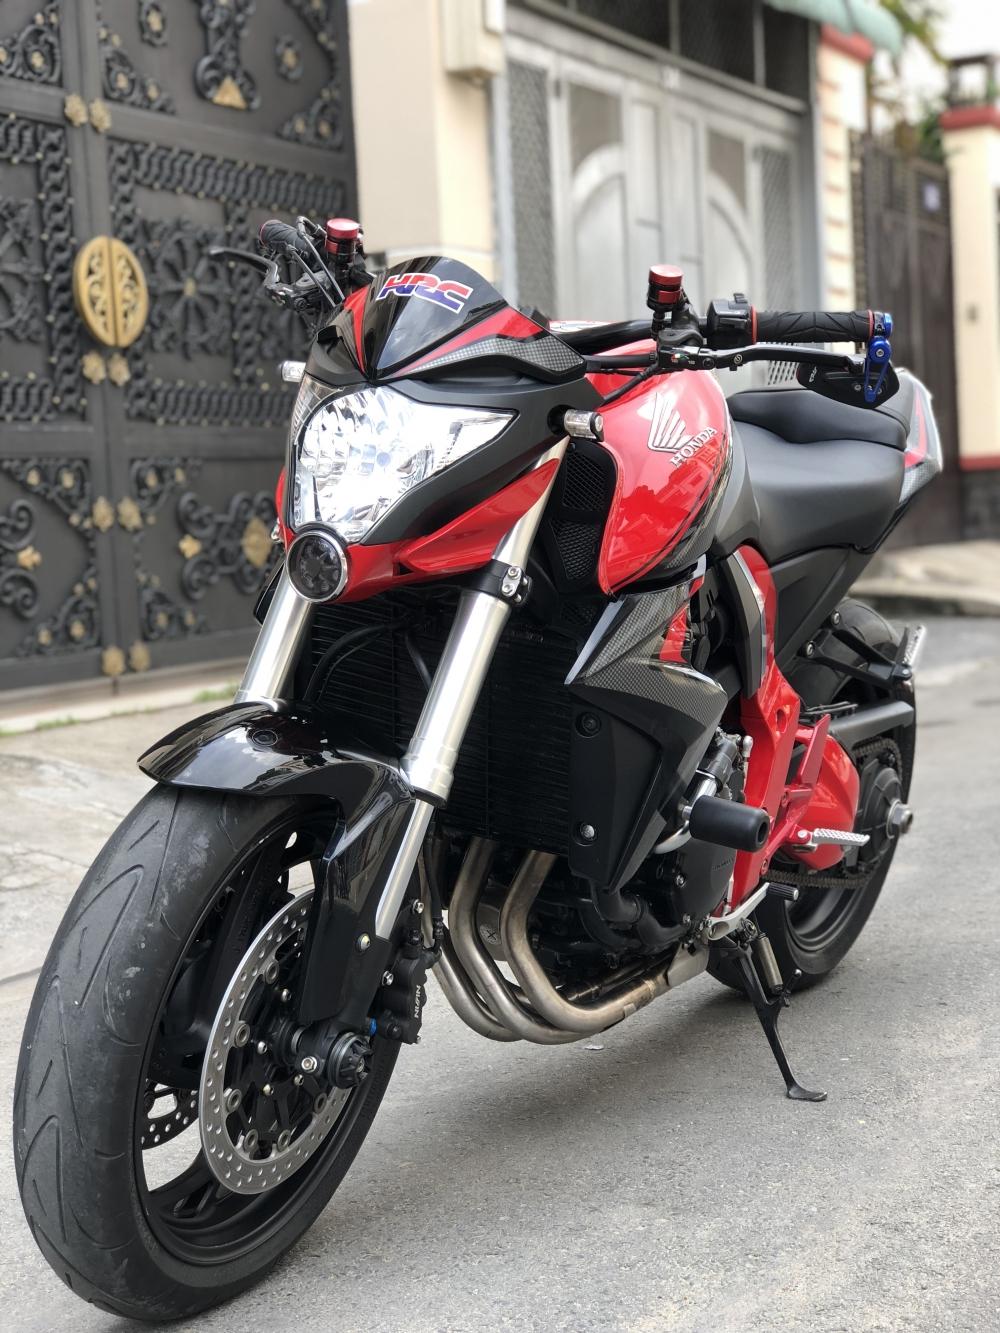 __Can Ban Honda CB1000R ABS date 42017 mau do doi cuoi cung cua CB1000Rodo 6000km HQCN ngay chu - 2